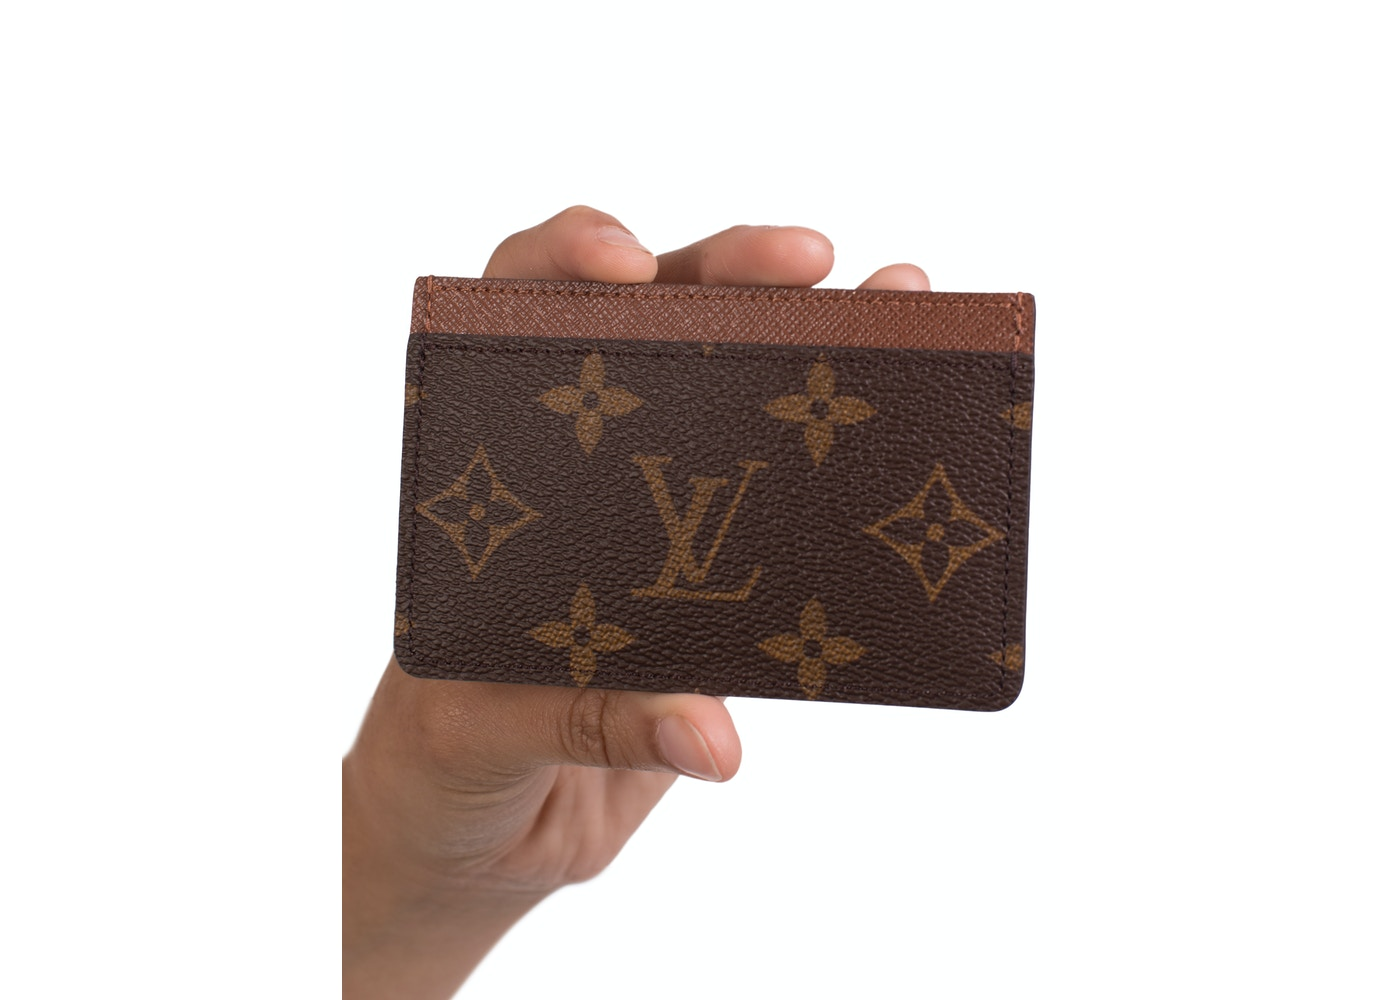 louis vuitton card holder monogram - Monogram Card Holder